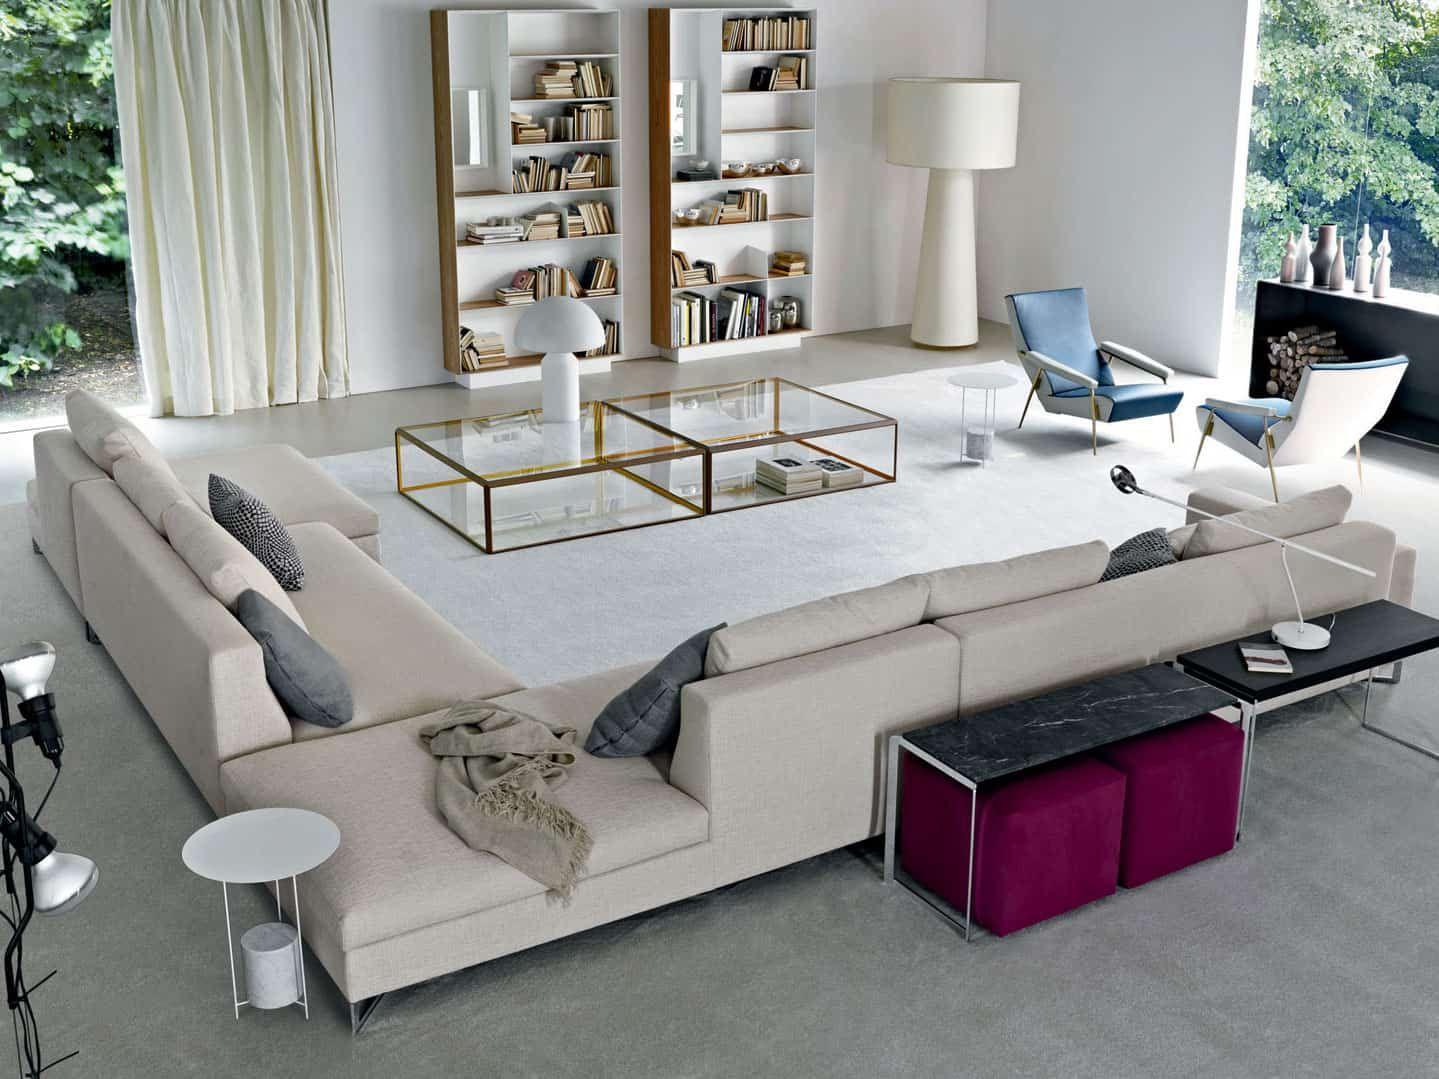 Modern Large Sectional Sofa Trendir Large Sectional Sofa Modern Sofa Sectional Living Room Furniture Layout